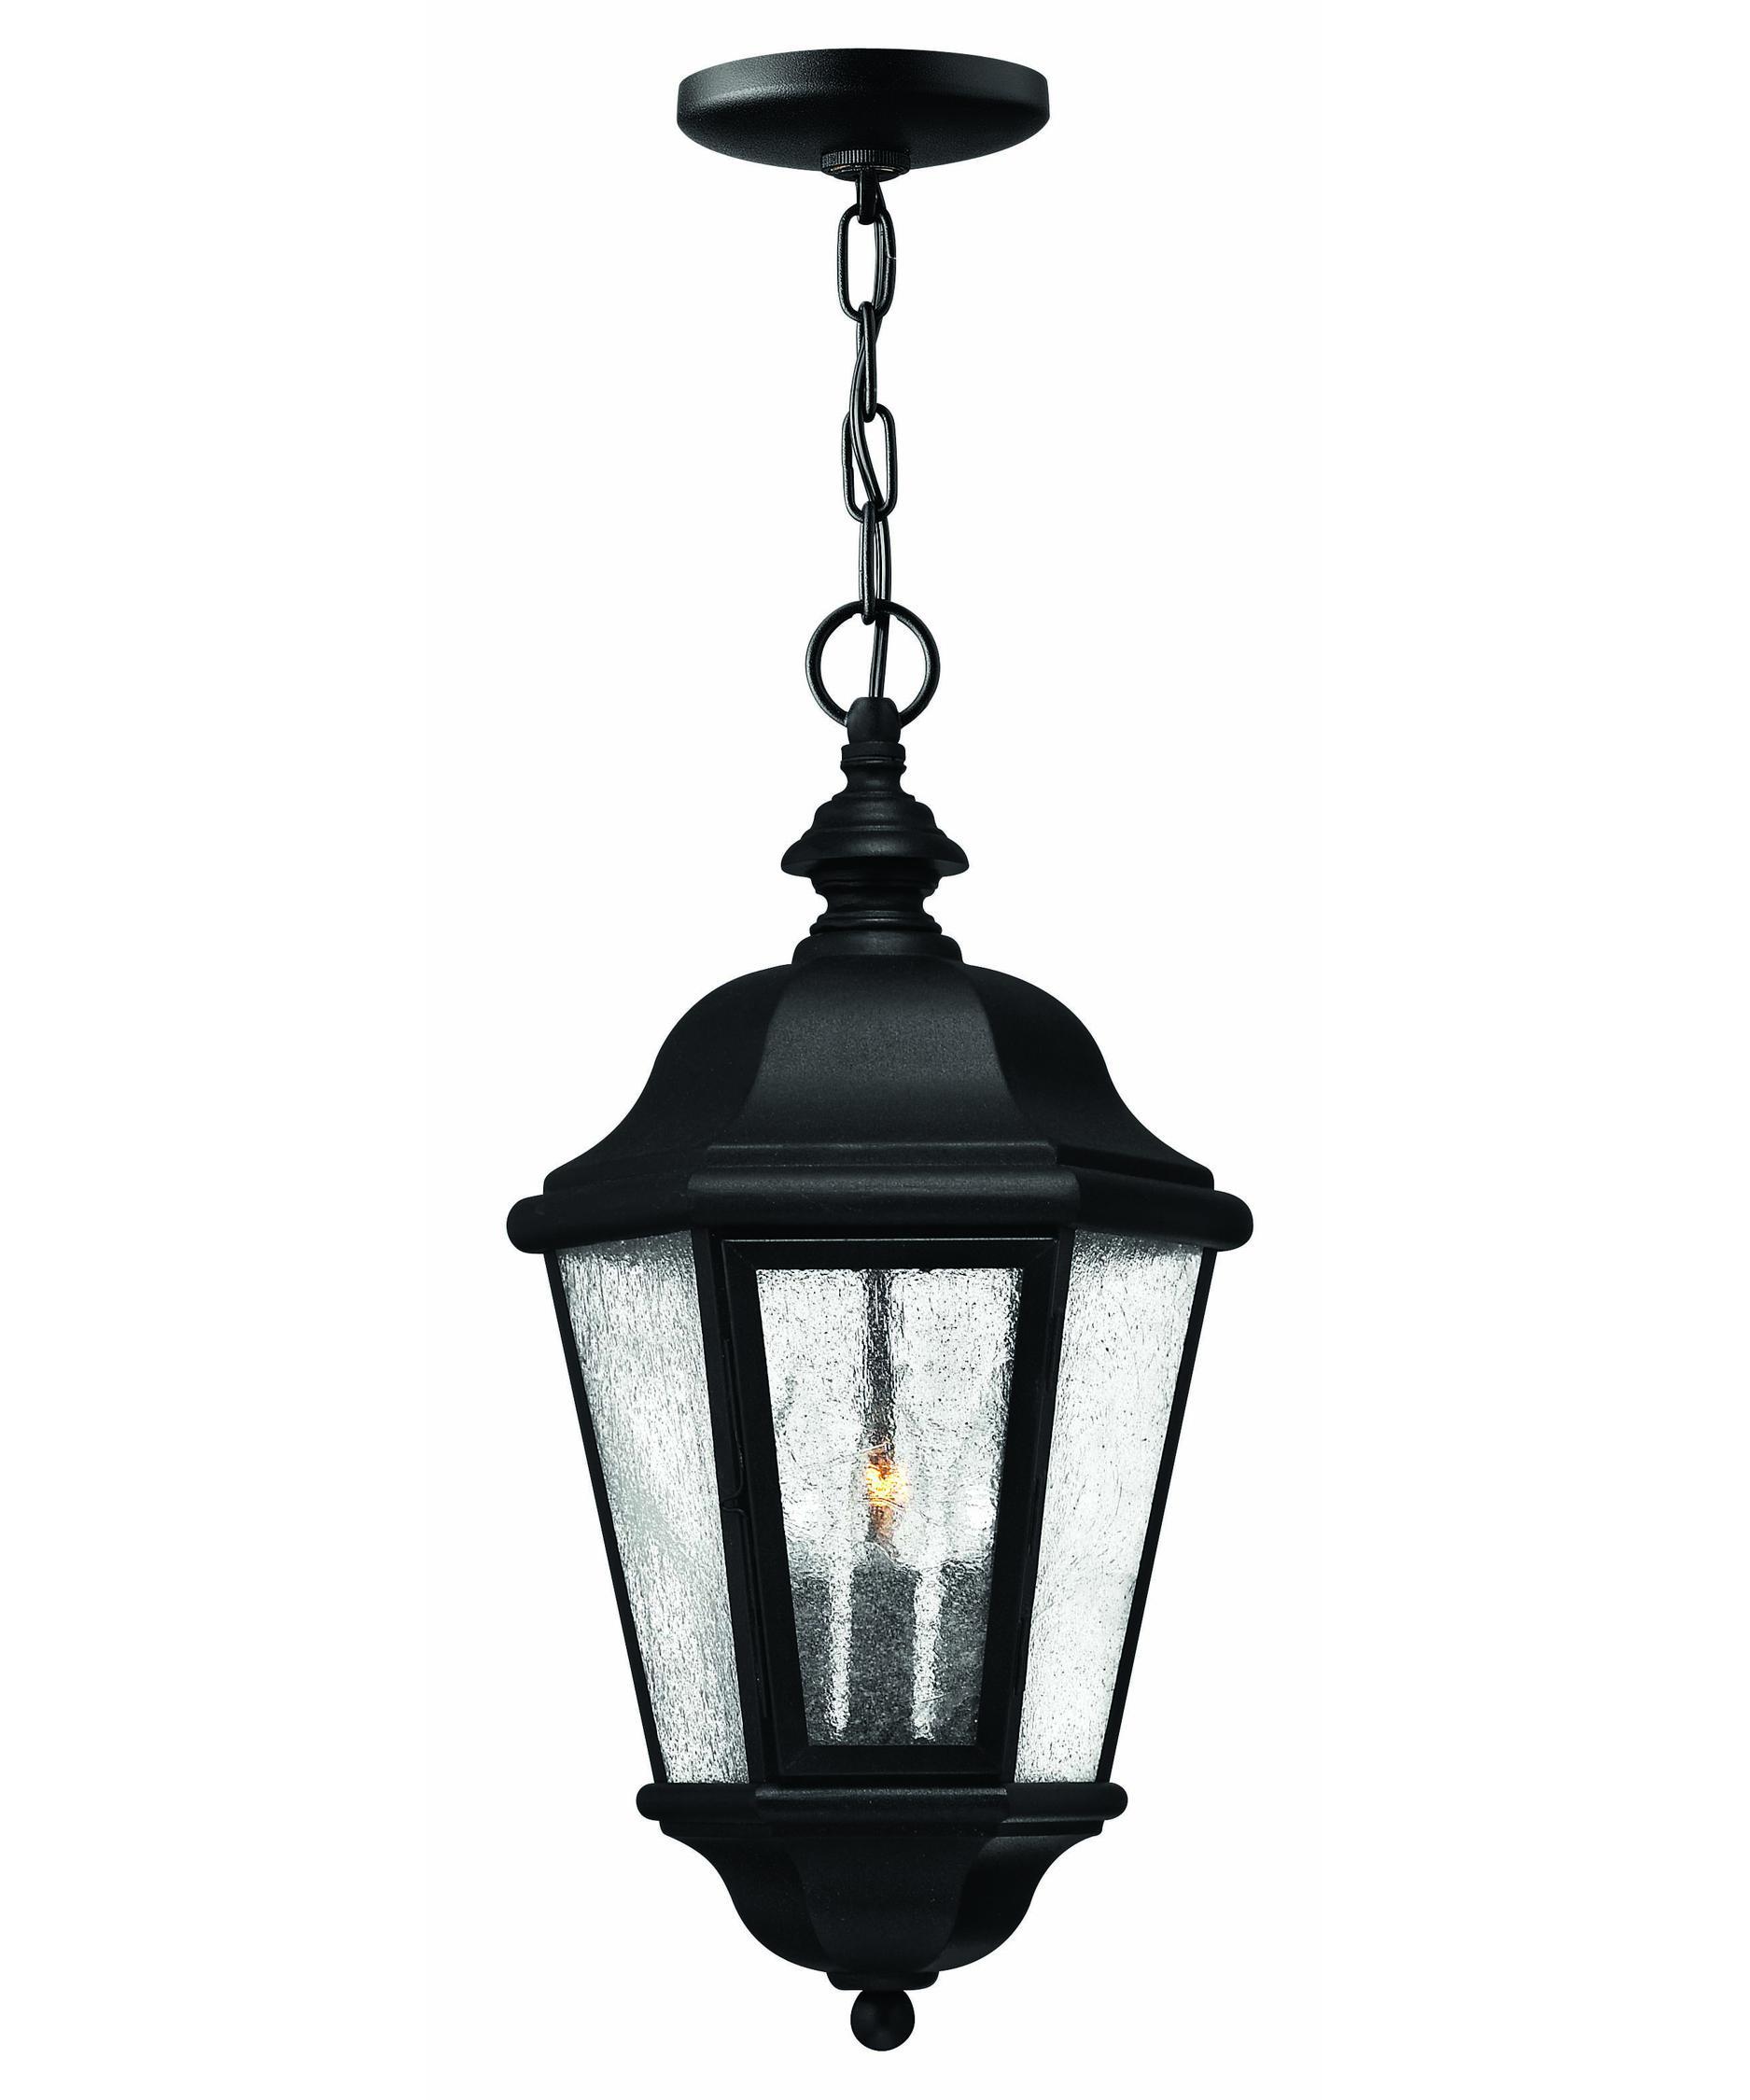 Hinkley Lighting 1672 Edgewater 10 Inch Wide 3 Light Outdoor Hinkley  Lighting 1672 Edgewater 10 Inch